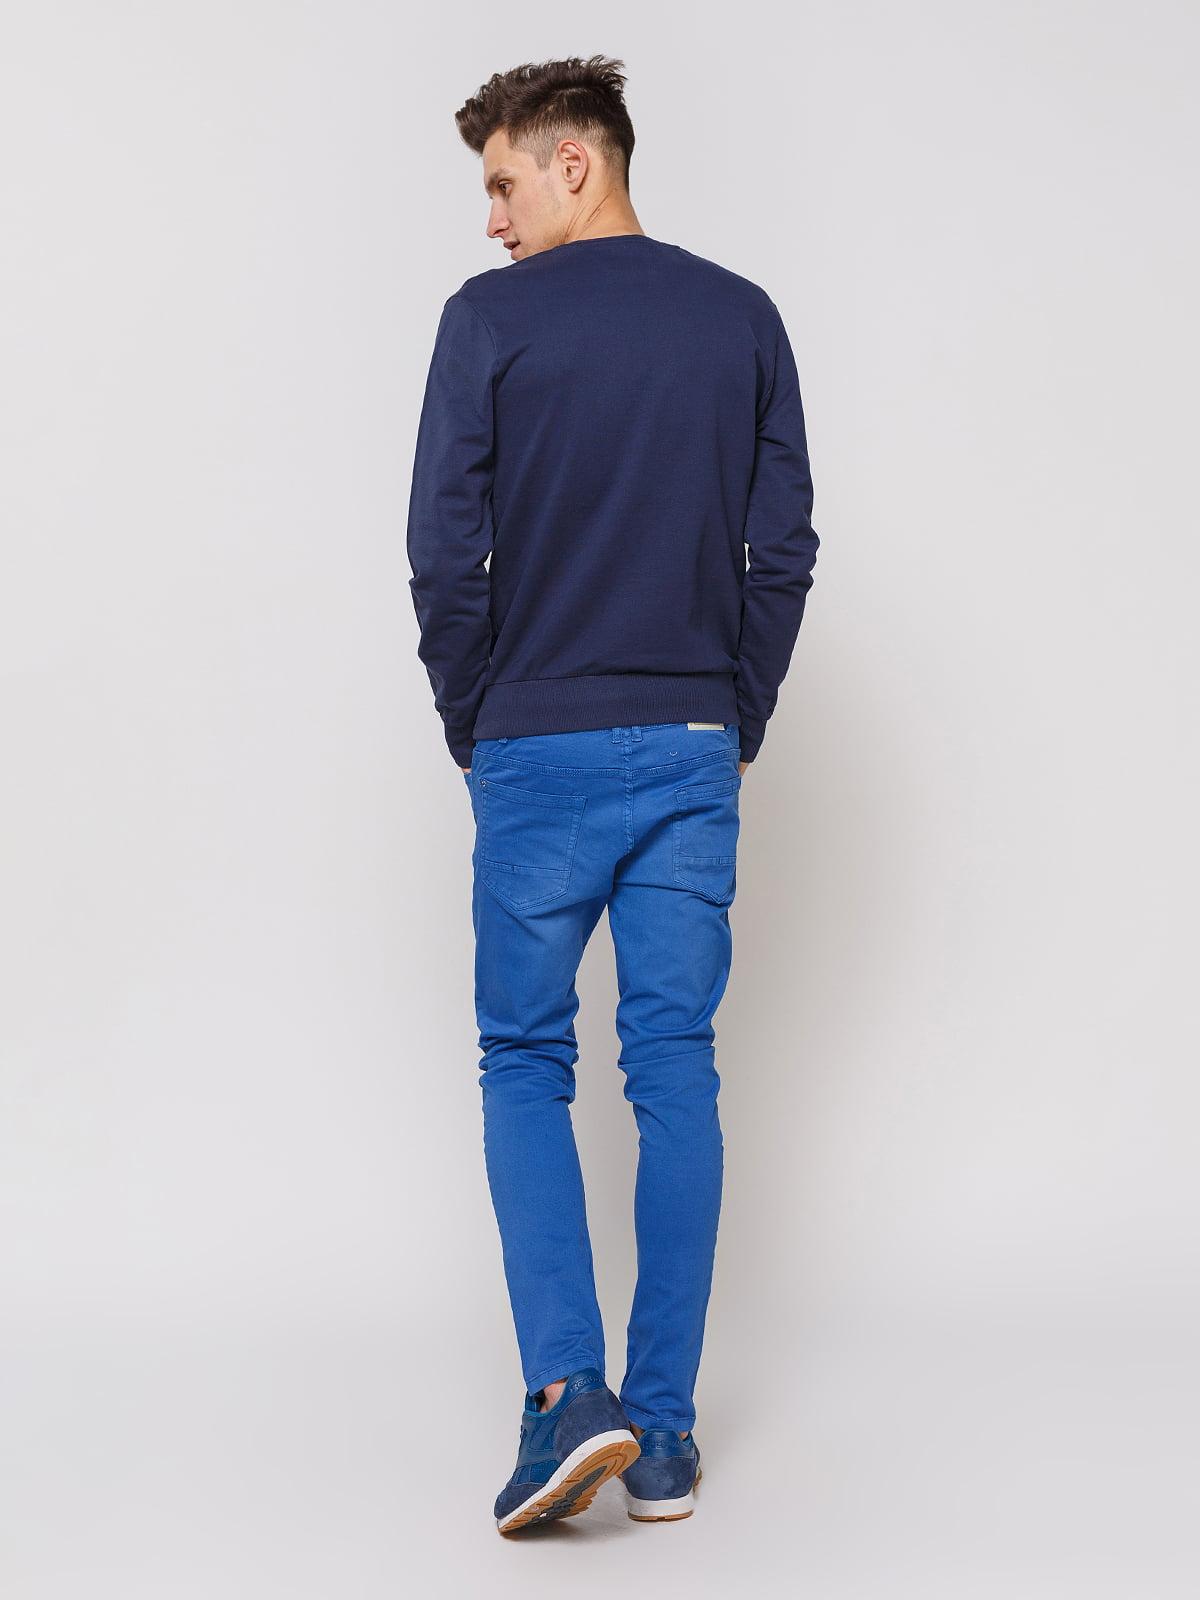 Штани сині | 3966833 | фото 3